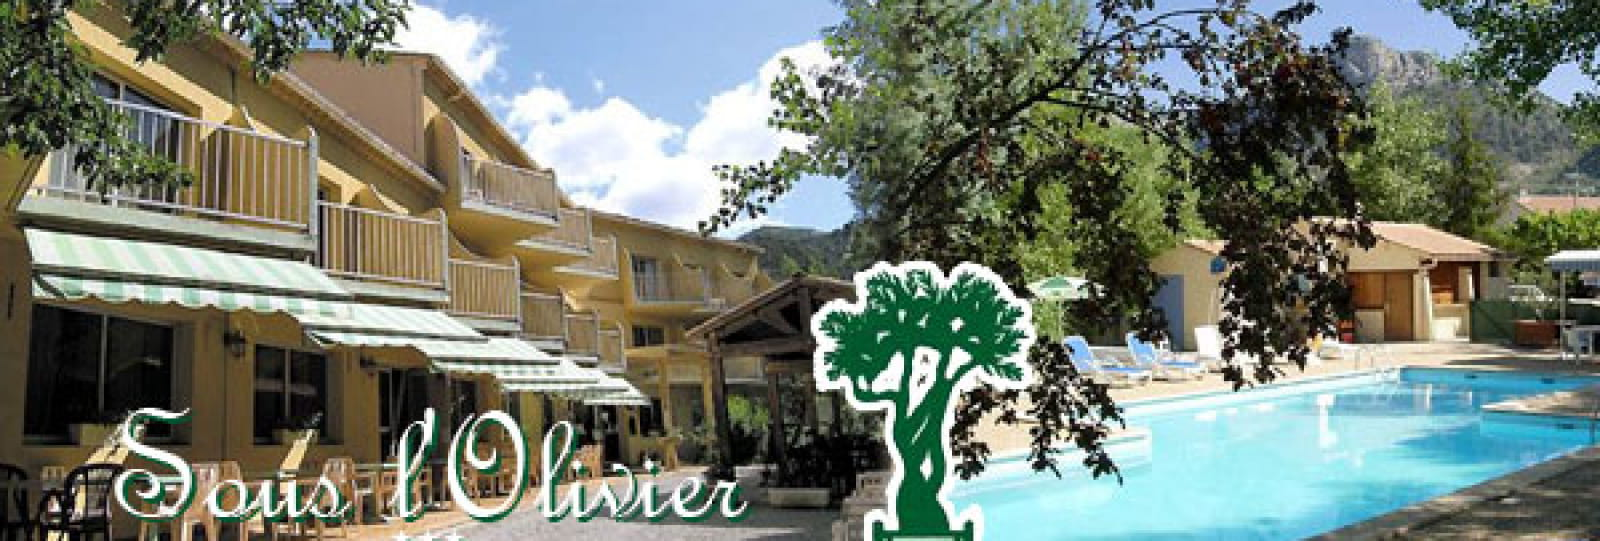 hôtel sous l'olivier